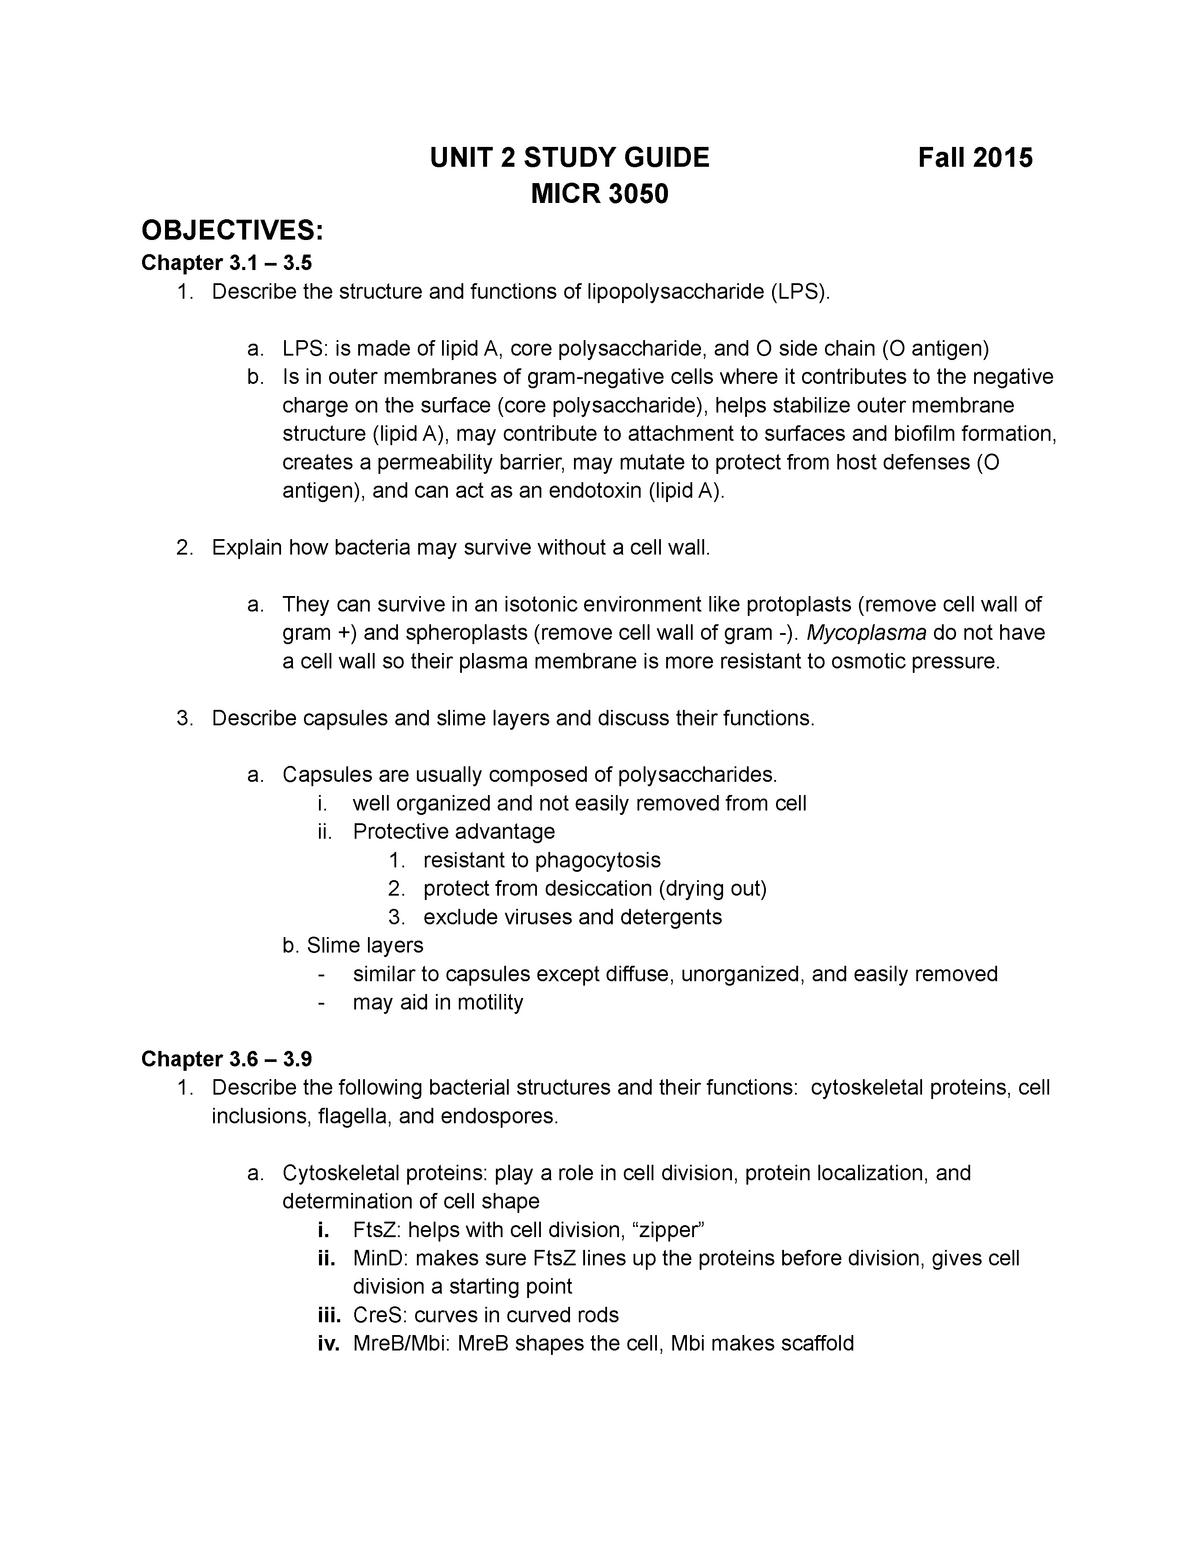 Copy of Unit 2 Study Guide - General Micro MICRO 305 - StuDocu